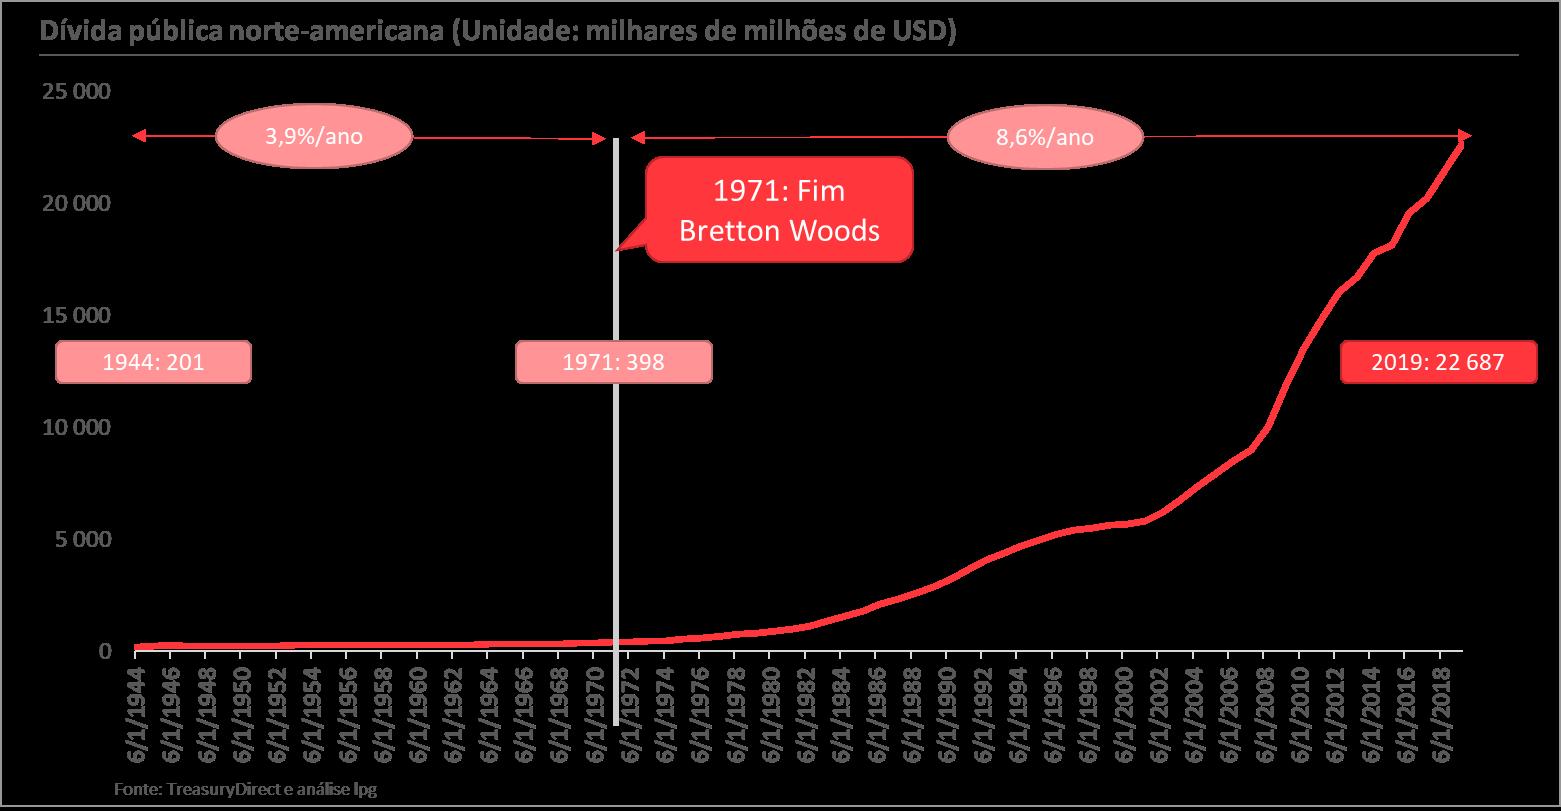 Gráfico Dívida pública norte-americana